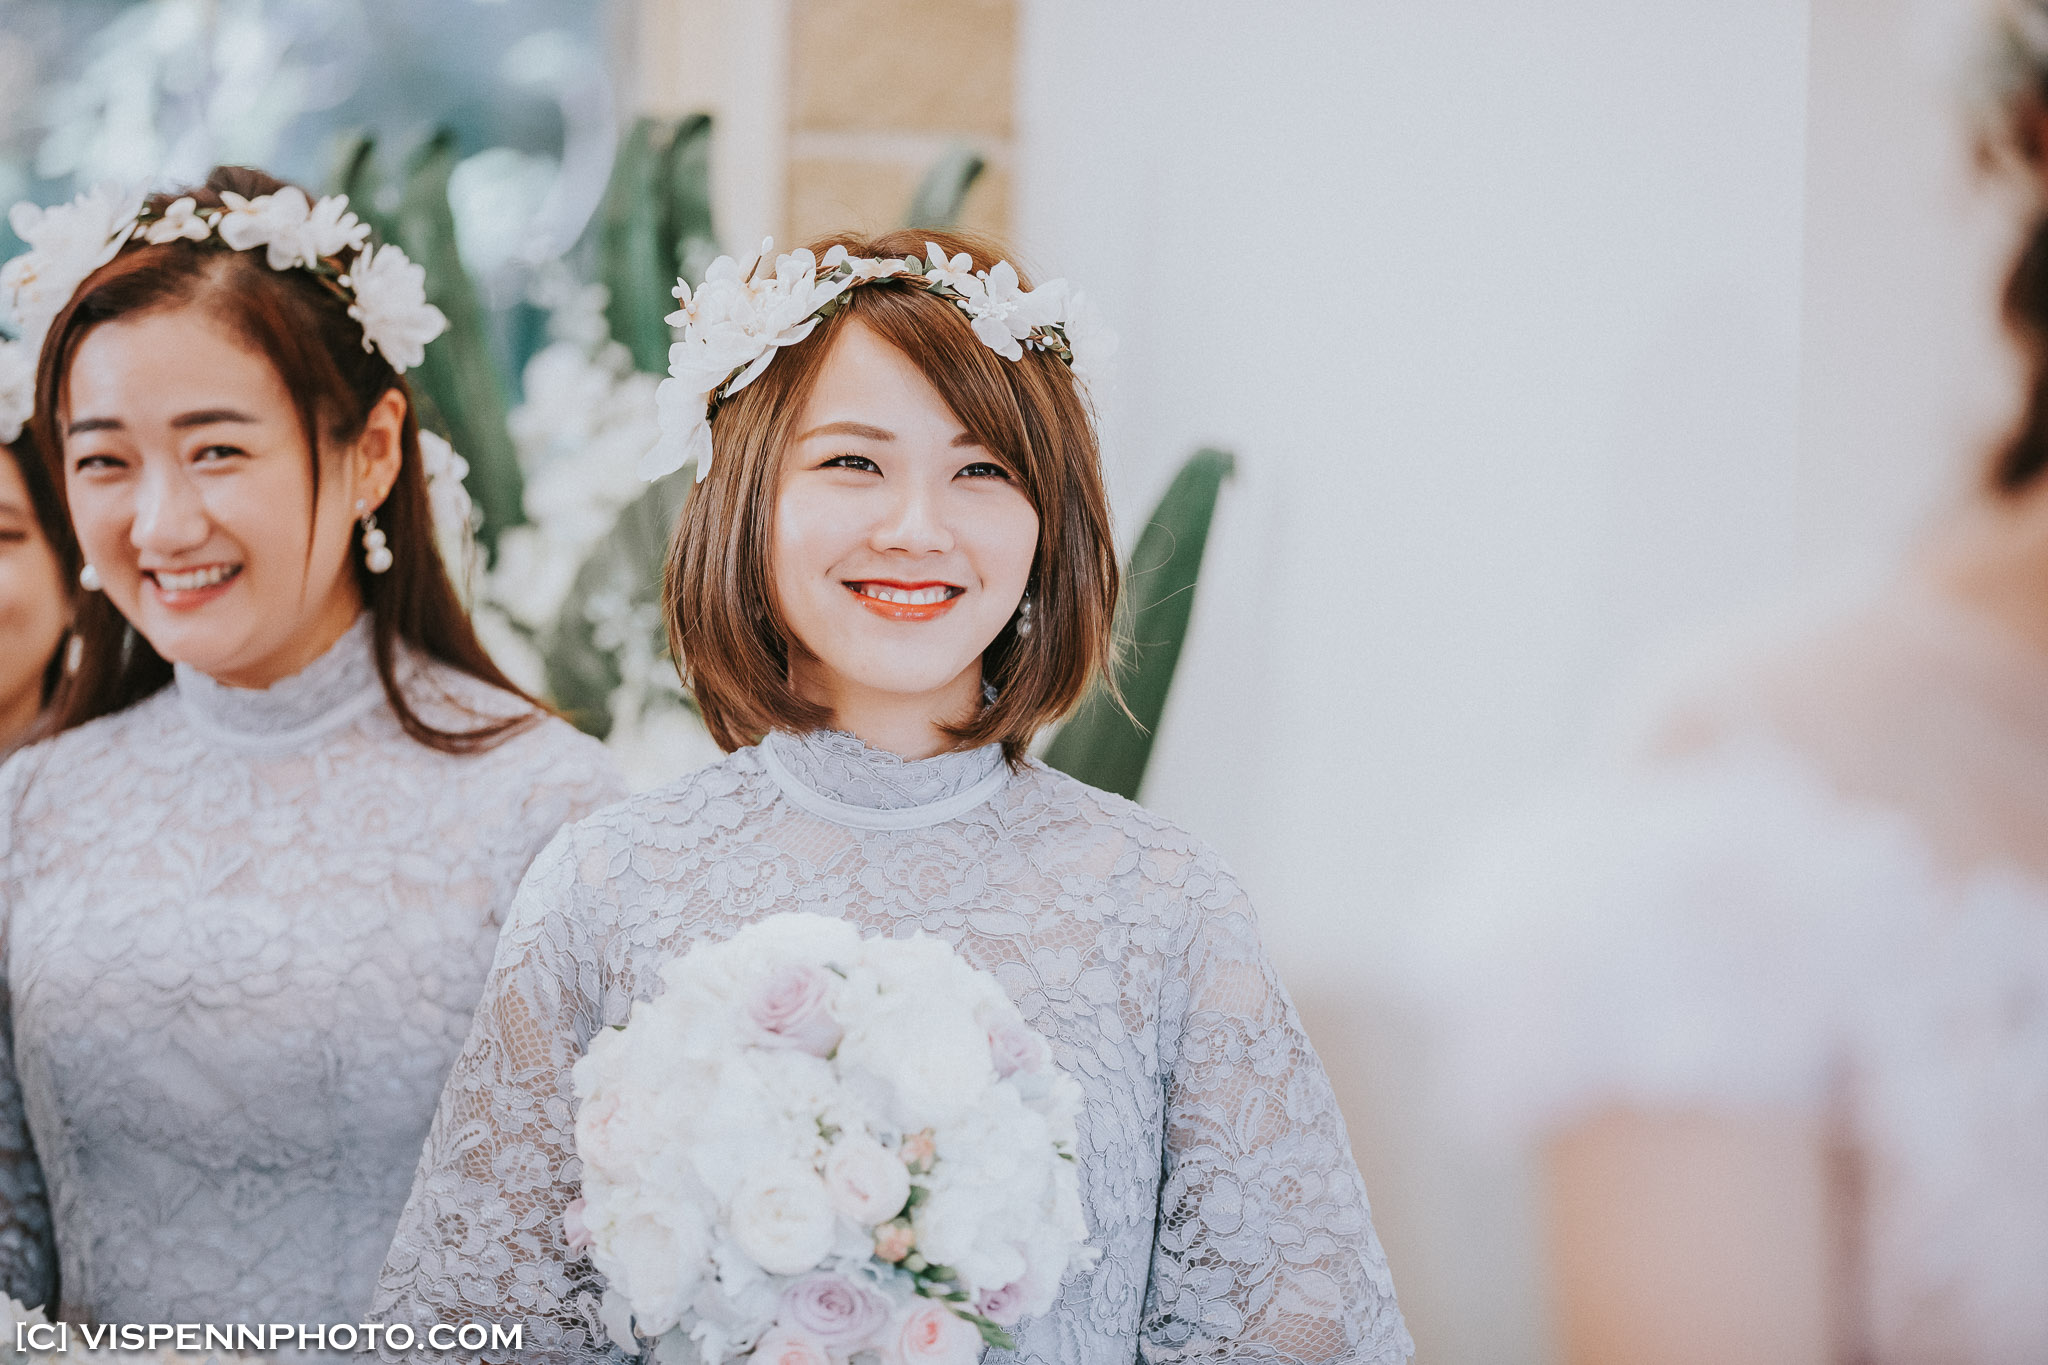 WEDDING DAY Photography Melbourne VISPENN 墨尔本 婚礼跟拍 婚礼摄像 婚礼摄影 结婚照 登记照 VISPENN H4 0209